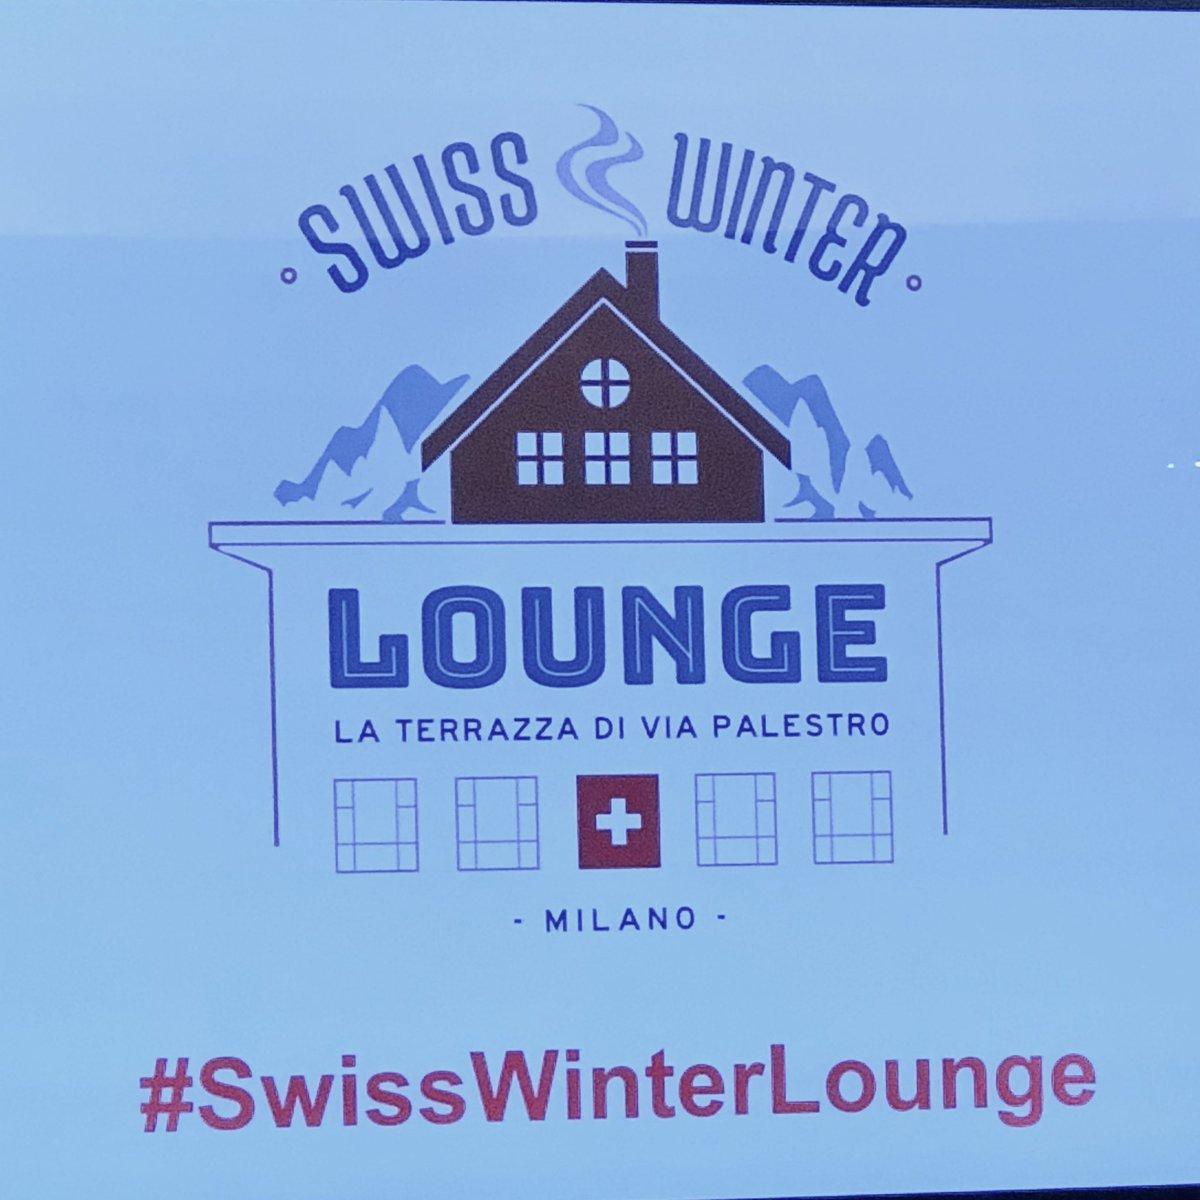 Swisswinterlounge Hashtag On Twitter